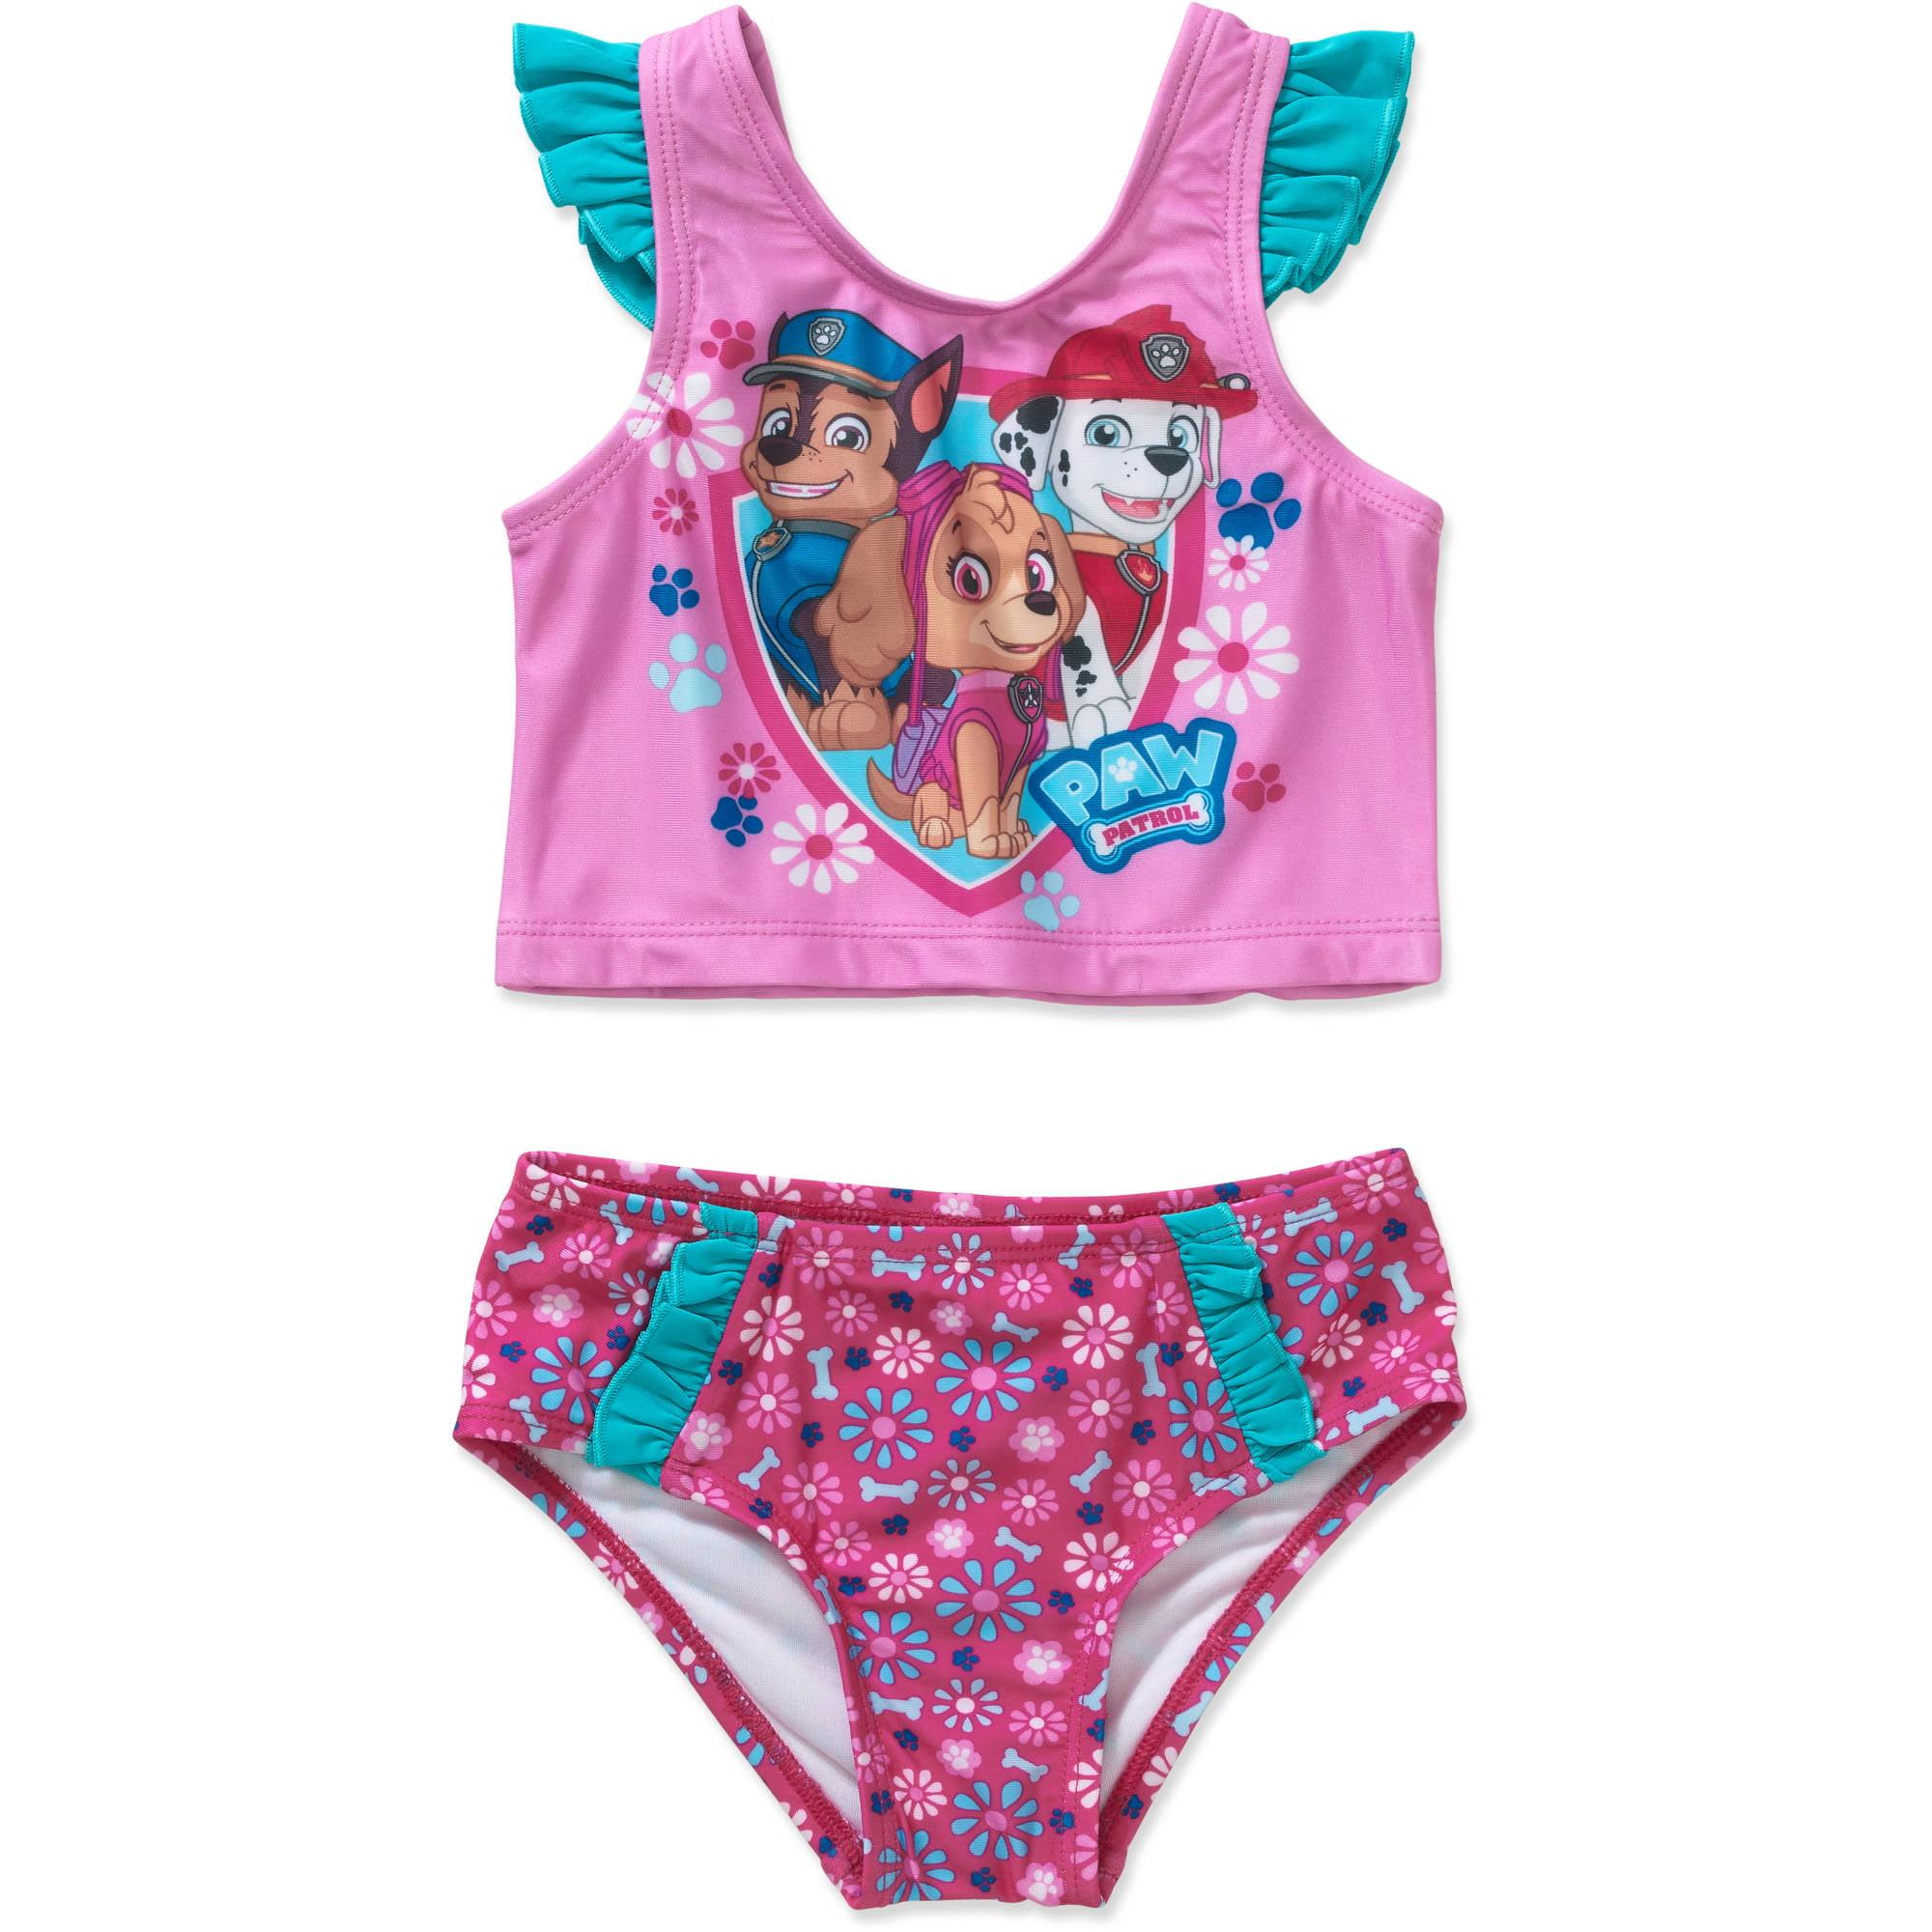 Chase Skye and Everest Toddler Girl Tankini Swimsuit Walmart